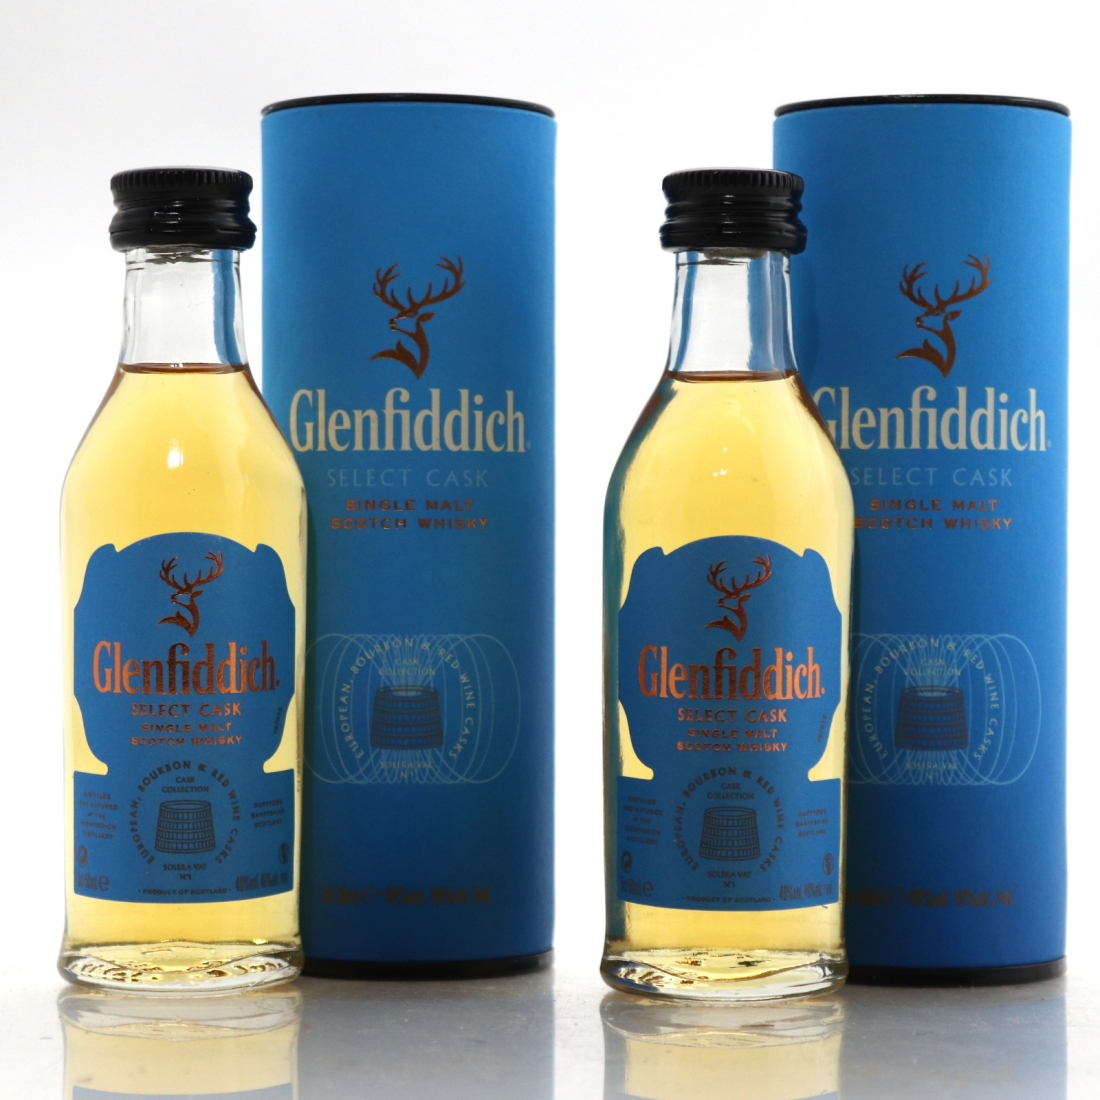 Glenfiddich Select Cask Miniature 2 x 5cl